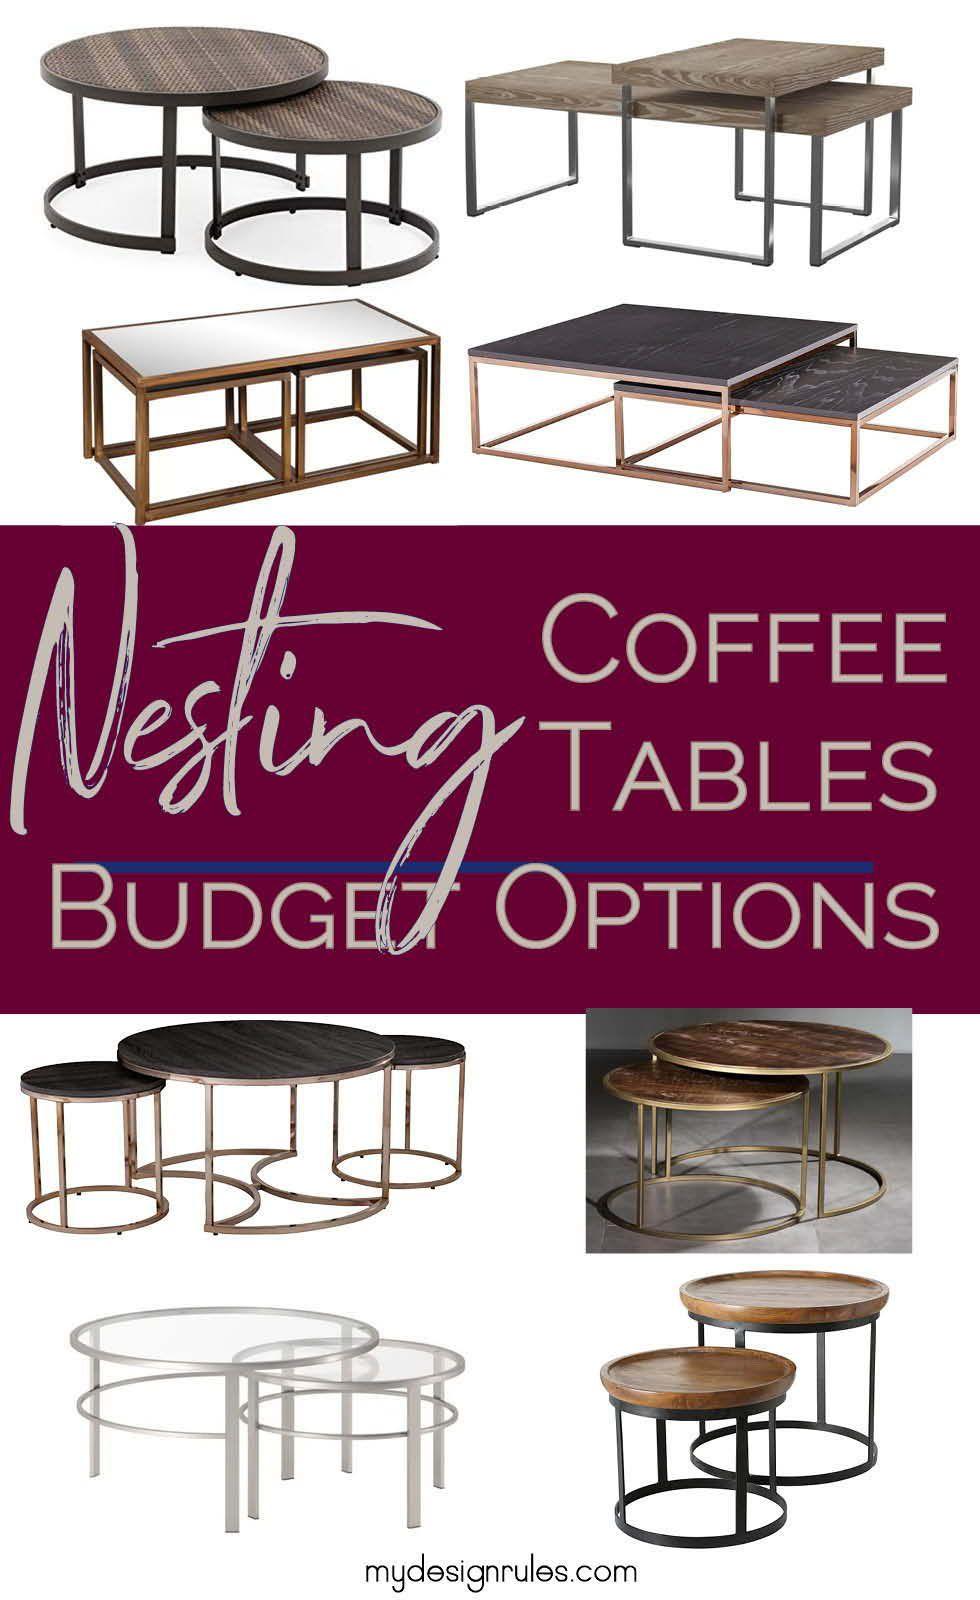 Budget Friendly Nesting Coffee Tables Nesting Coffee Tables Coffee Table Painted Coffee Tables [ 1600 x 980 Pixel ]